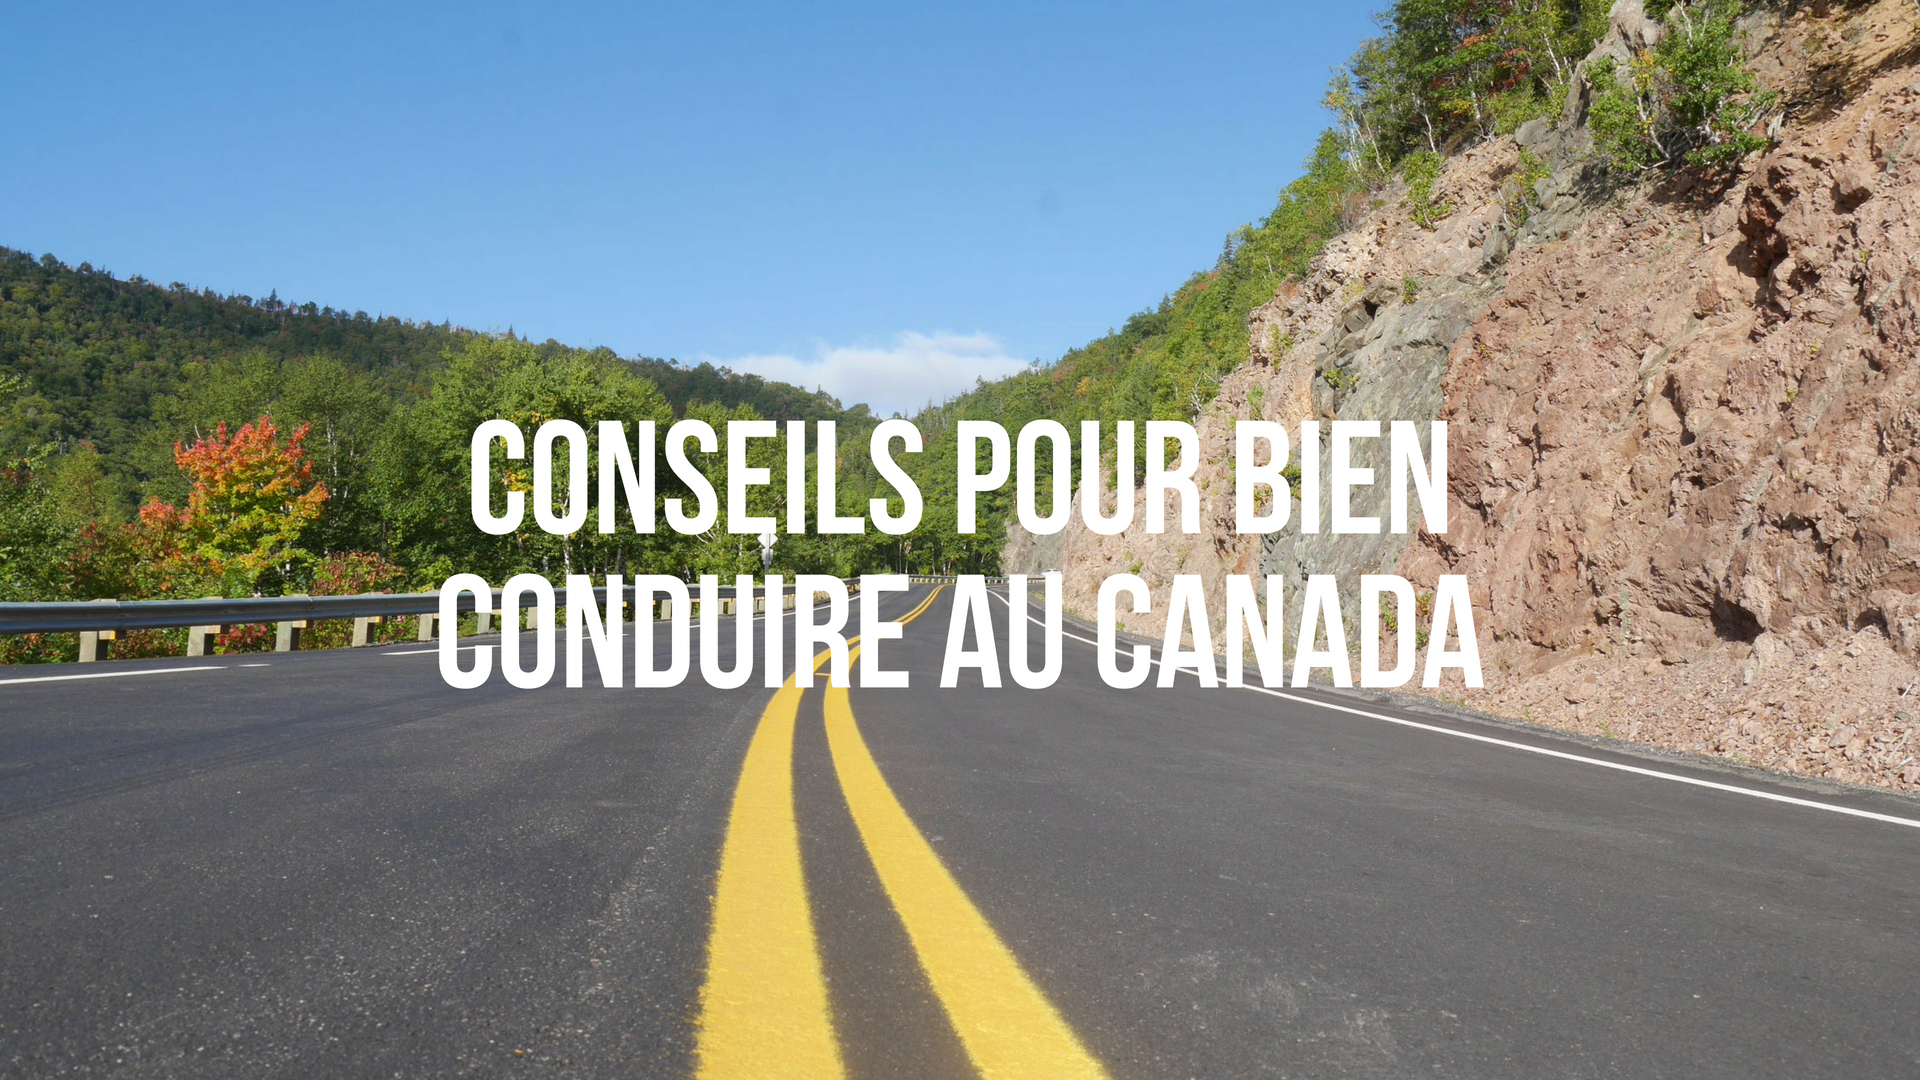 conduire au canada code de la route blog road-trip voyage arpenter le chemin